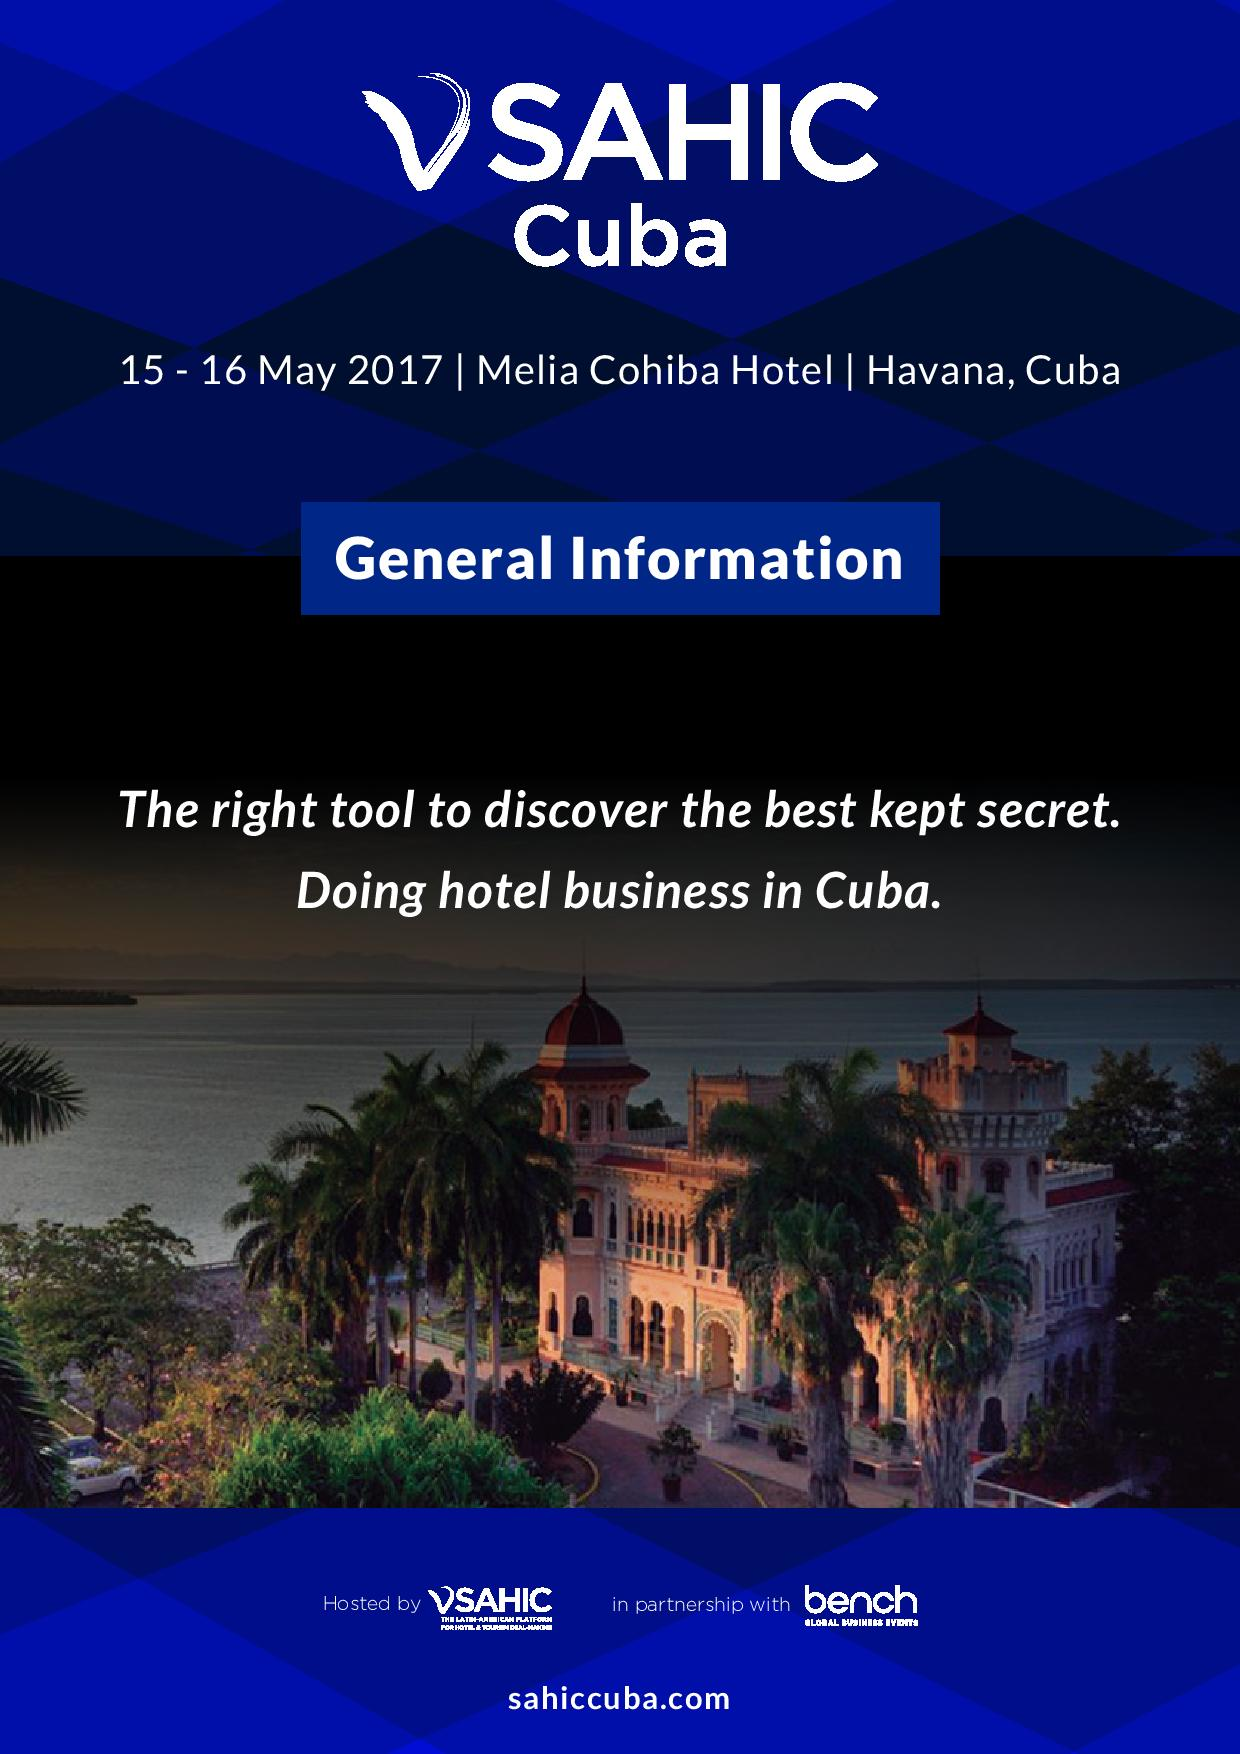 sahic-cuba-general-info-2017-page-001